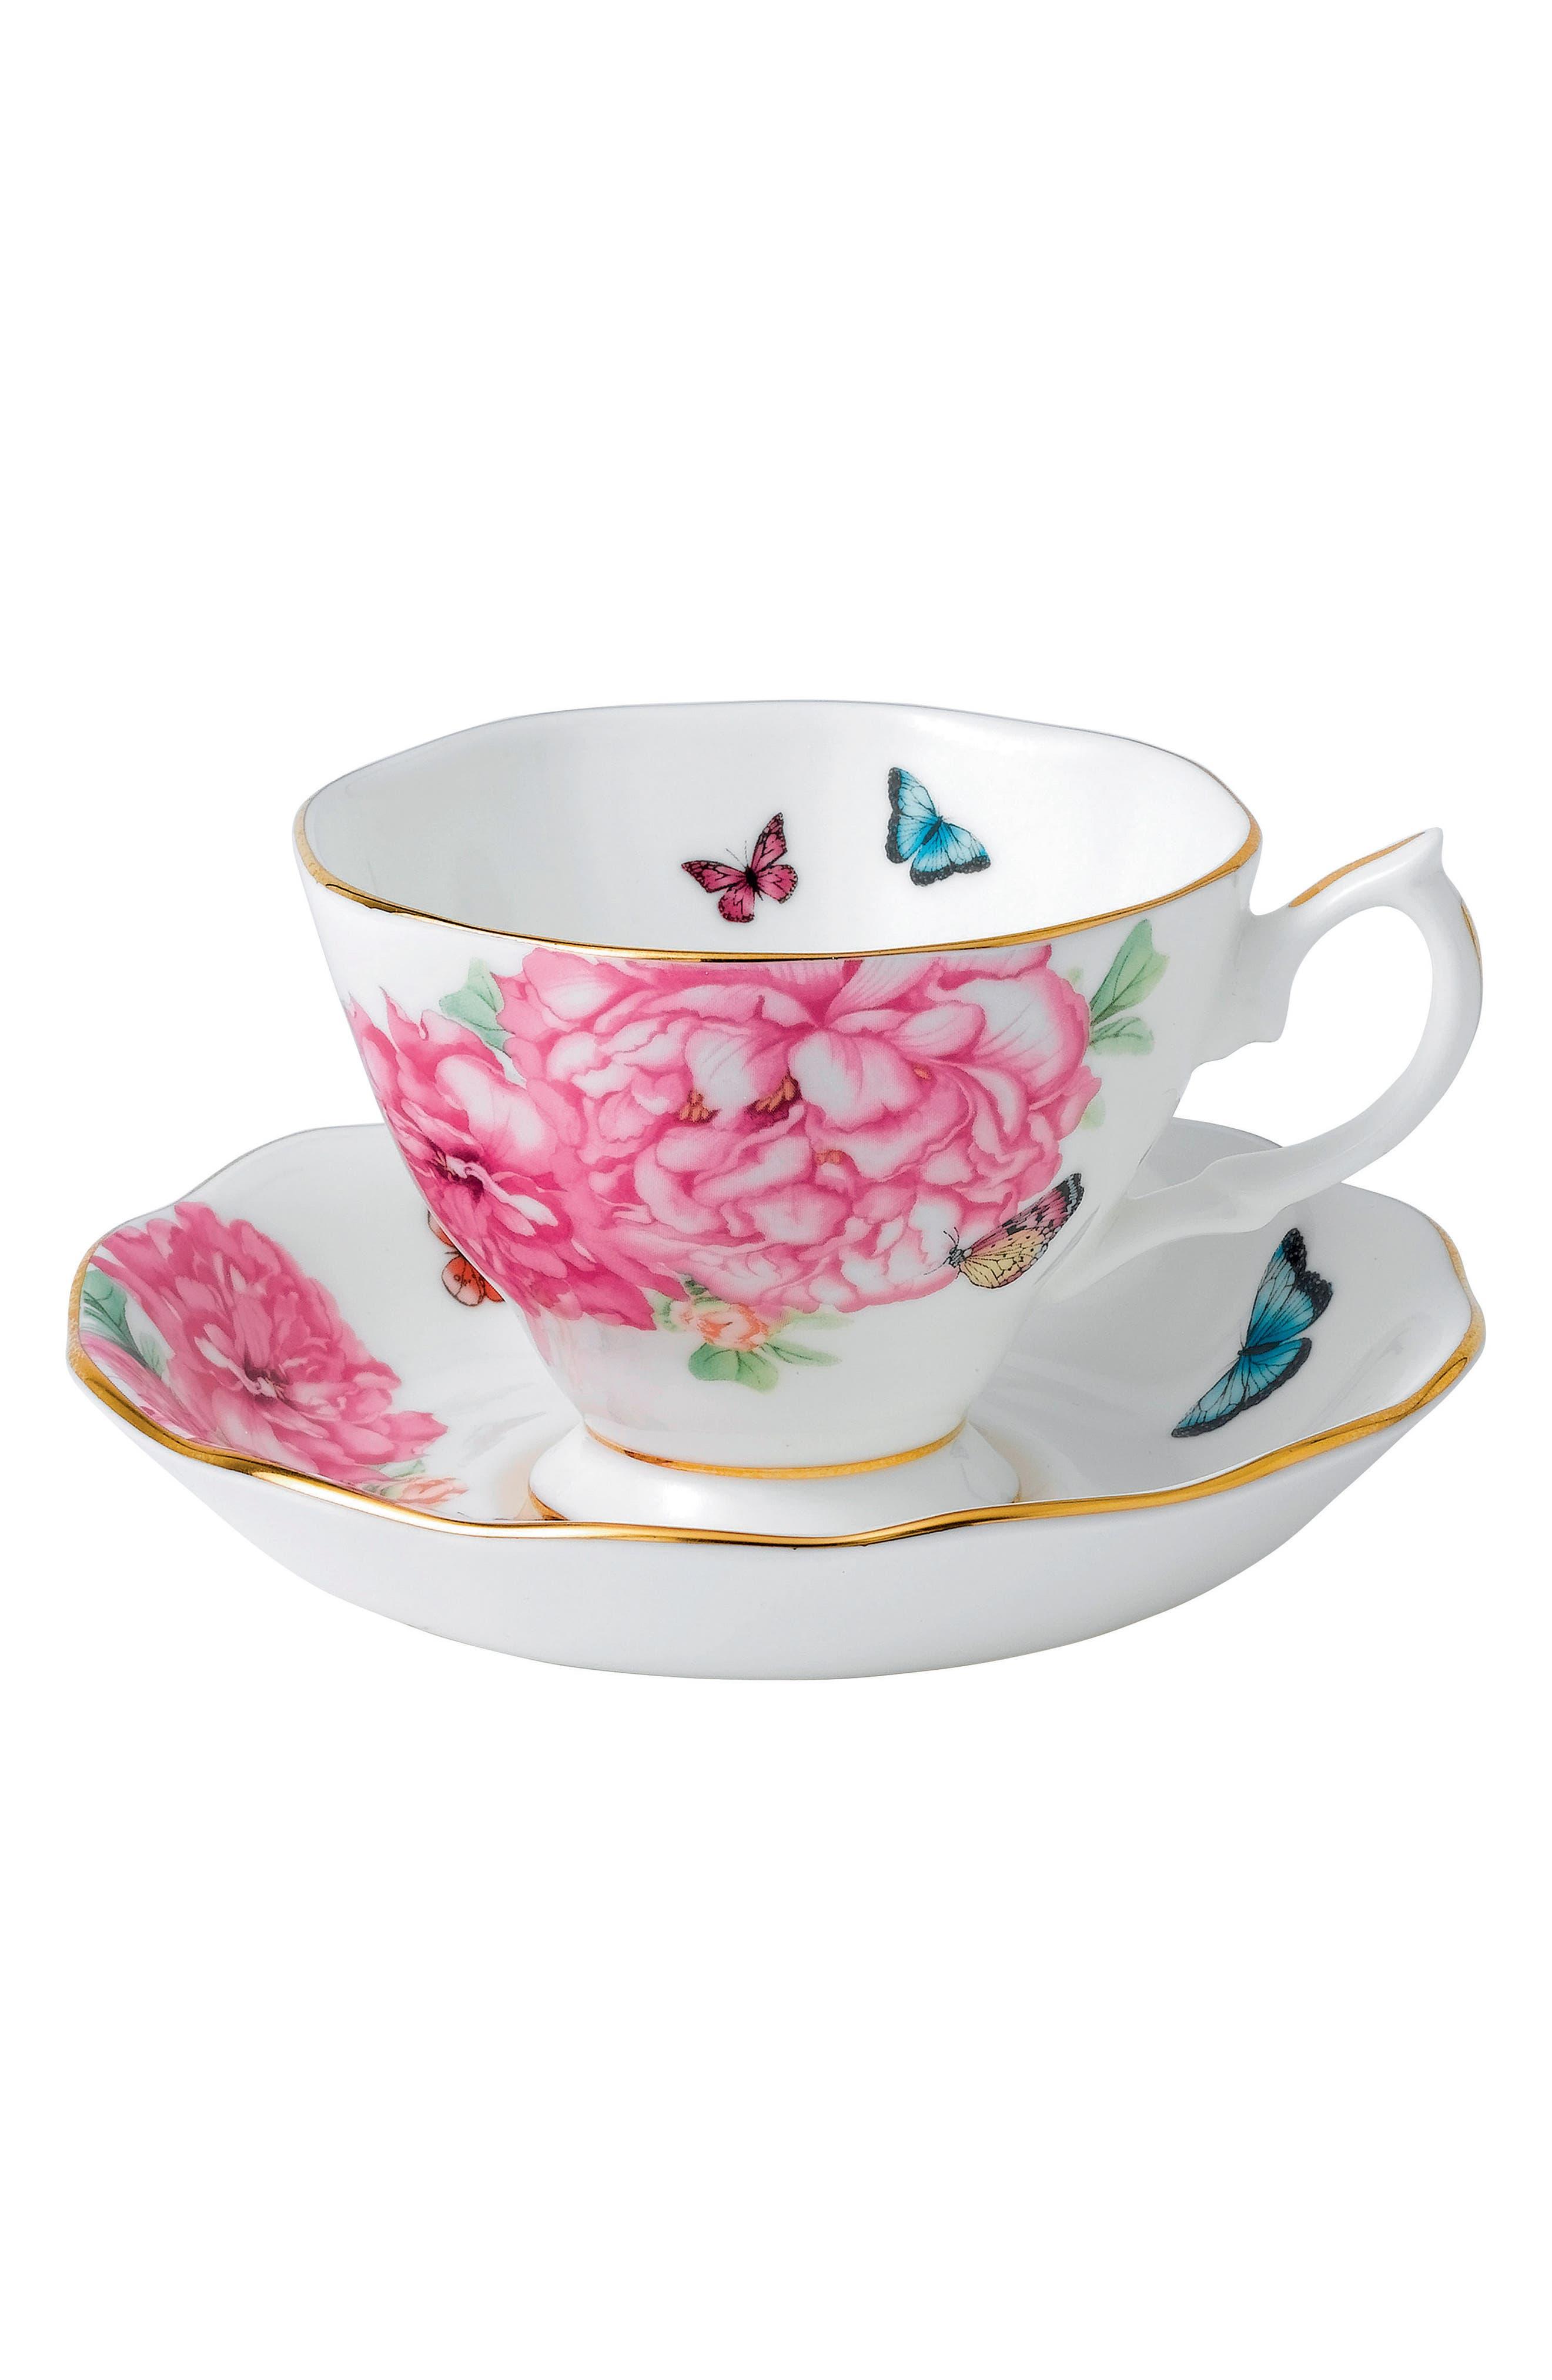 Friendship Teacup & Saucer,                             Main thumbnail 1, color,